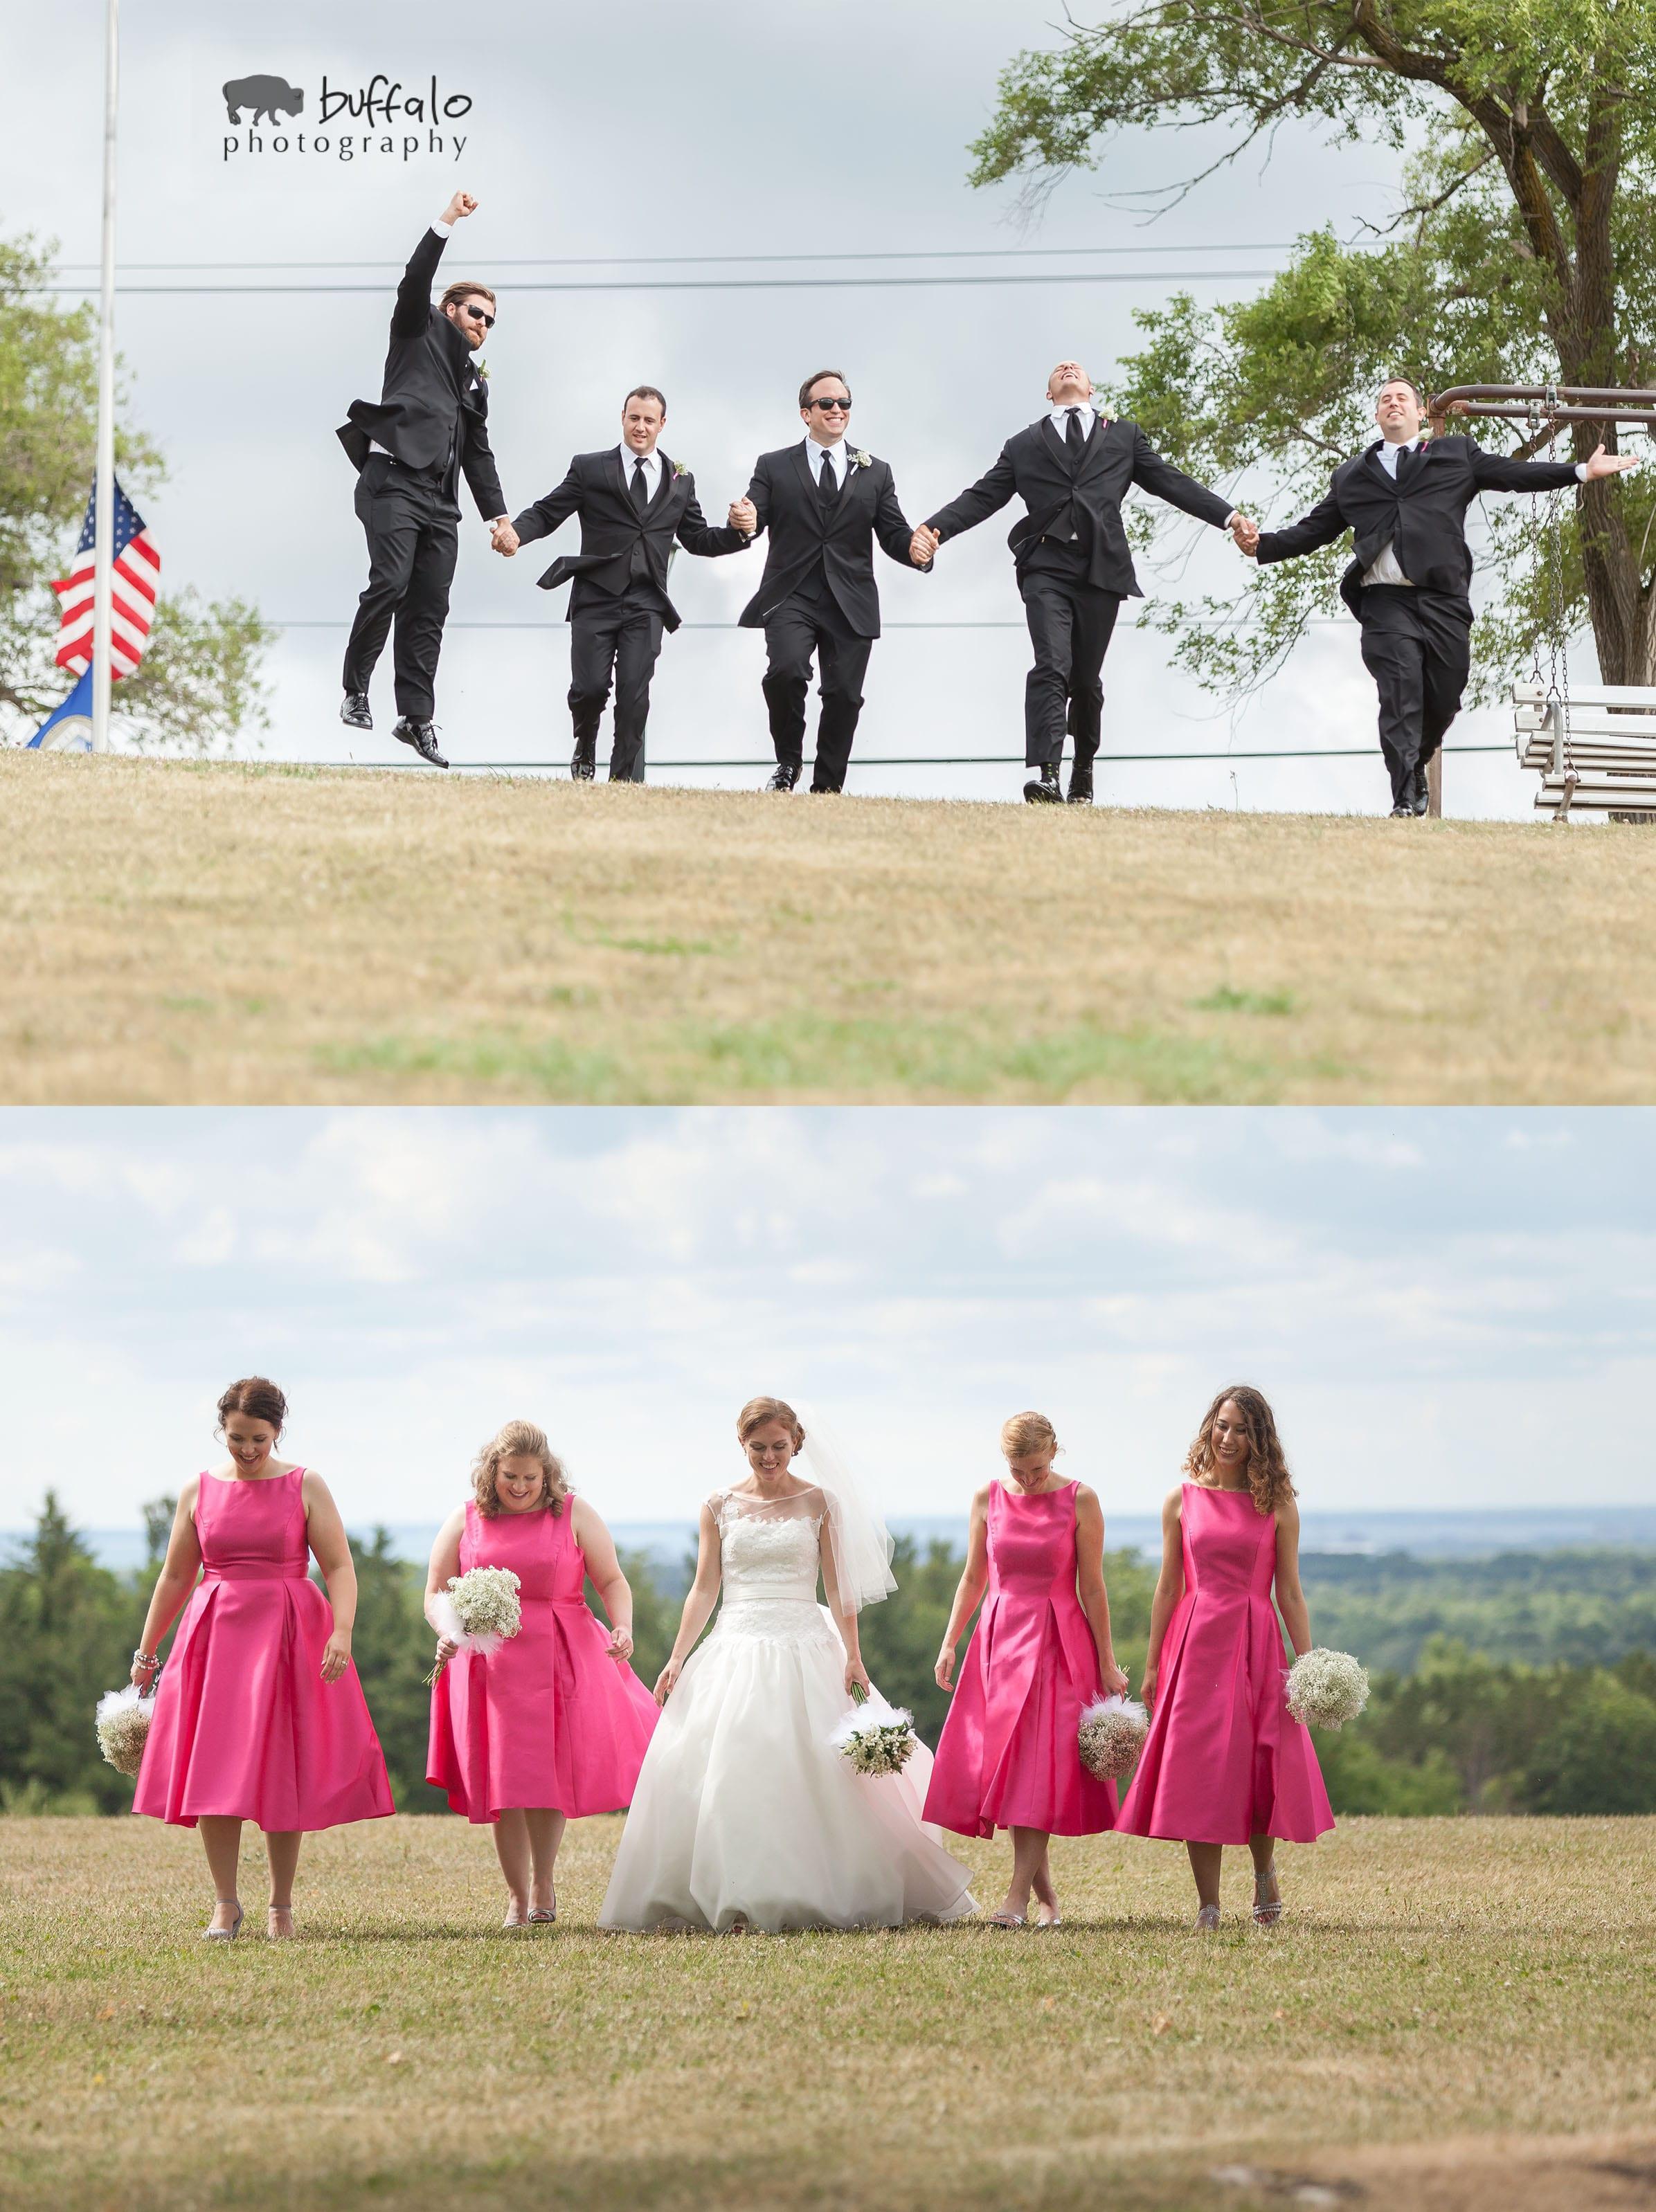 Buffalo Wedding Photography Klocs Grove Molly and Brian  Buffalo Photography LLC